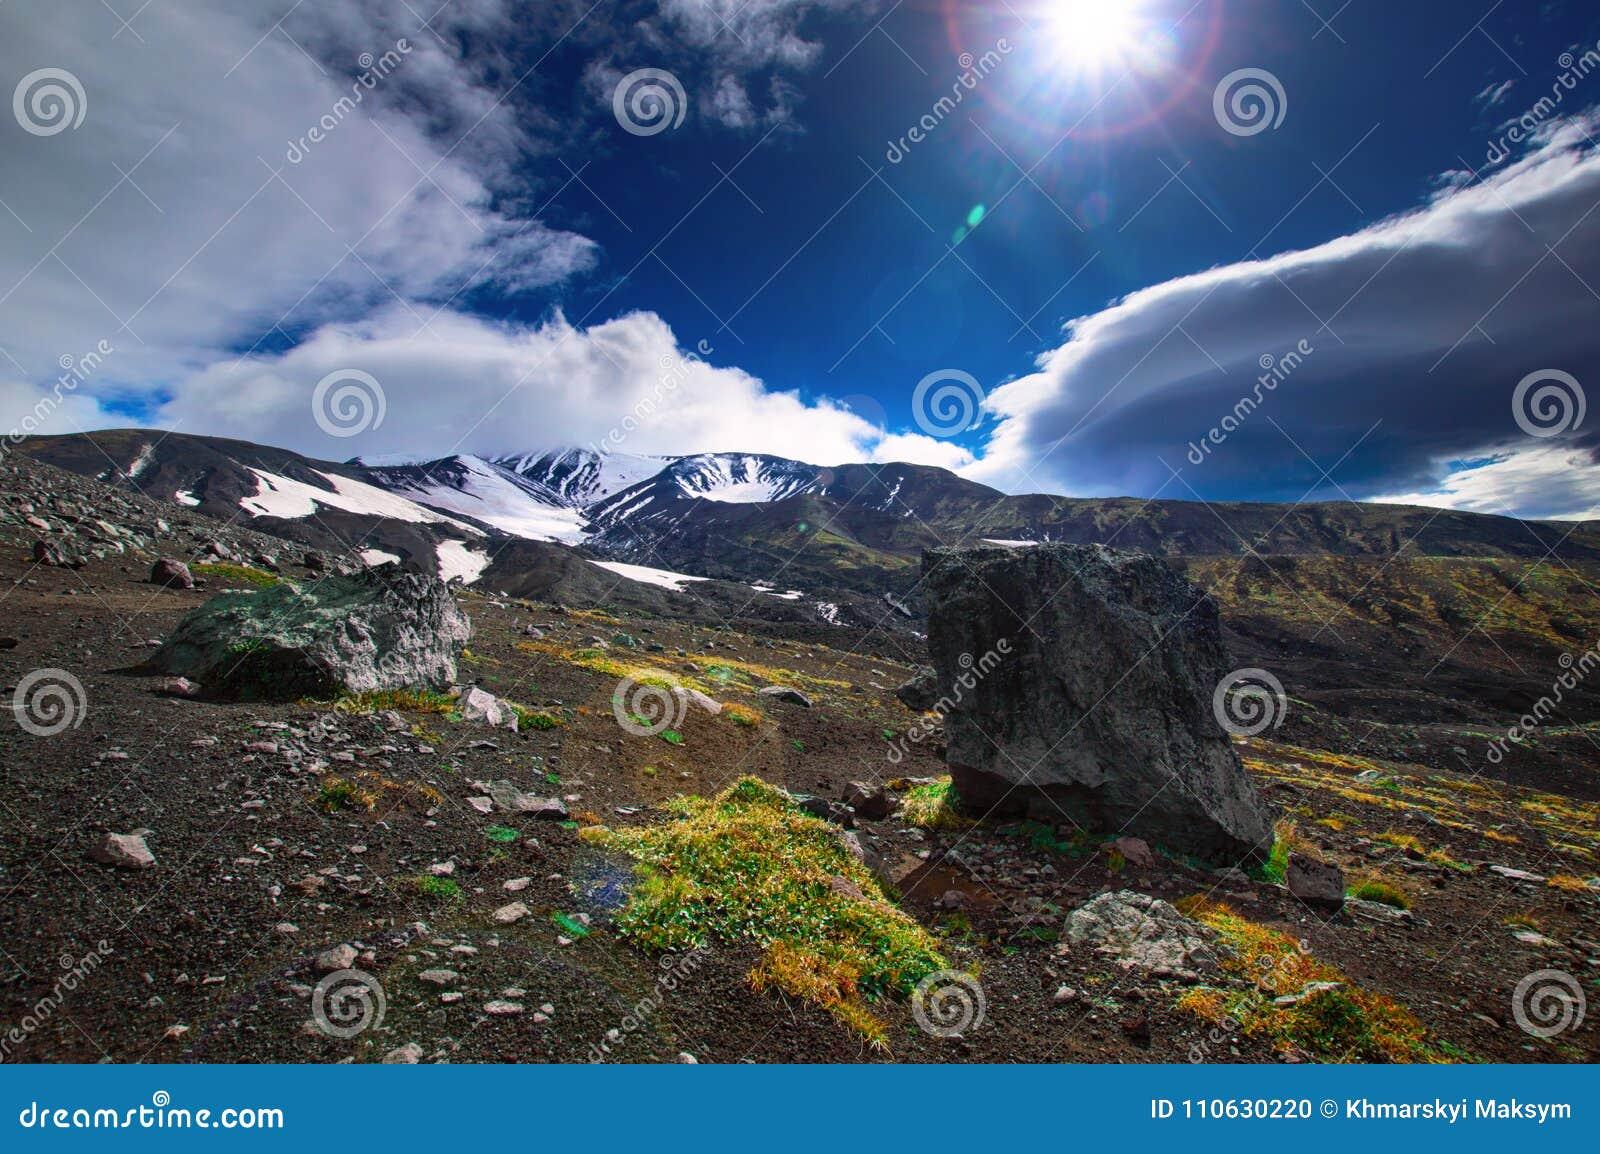 Vulkanisk liggande Avachinsky vulkan - aktiv vulkan av den Kamchatka halvön Ryssland Far East